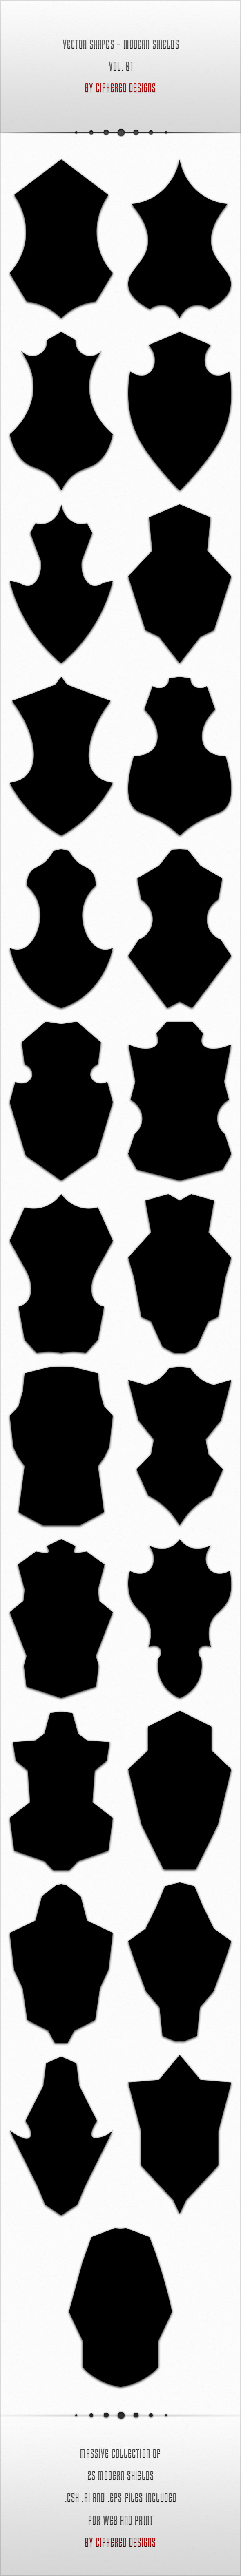 Vector Shapes - Modern Shields Vol. 01 - Symbols Shapes